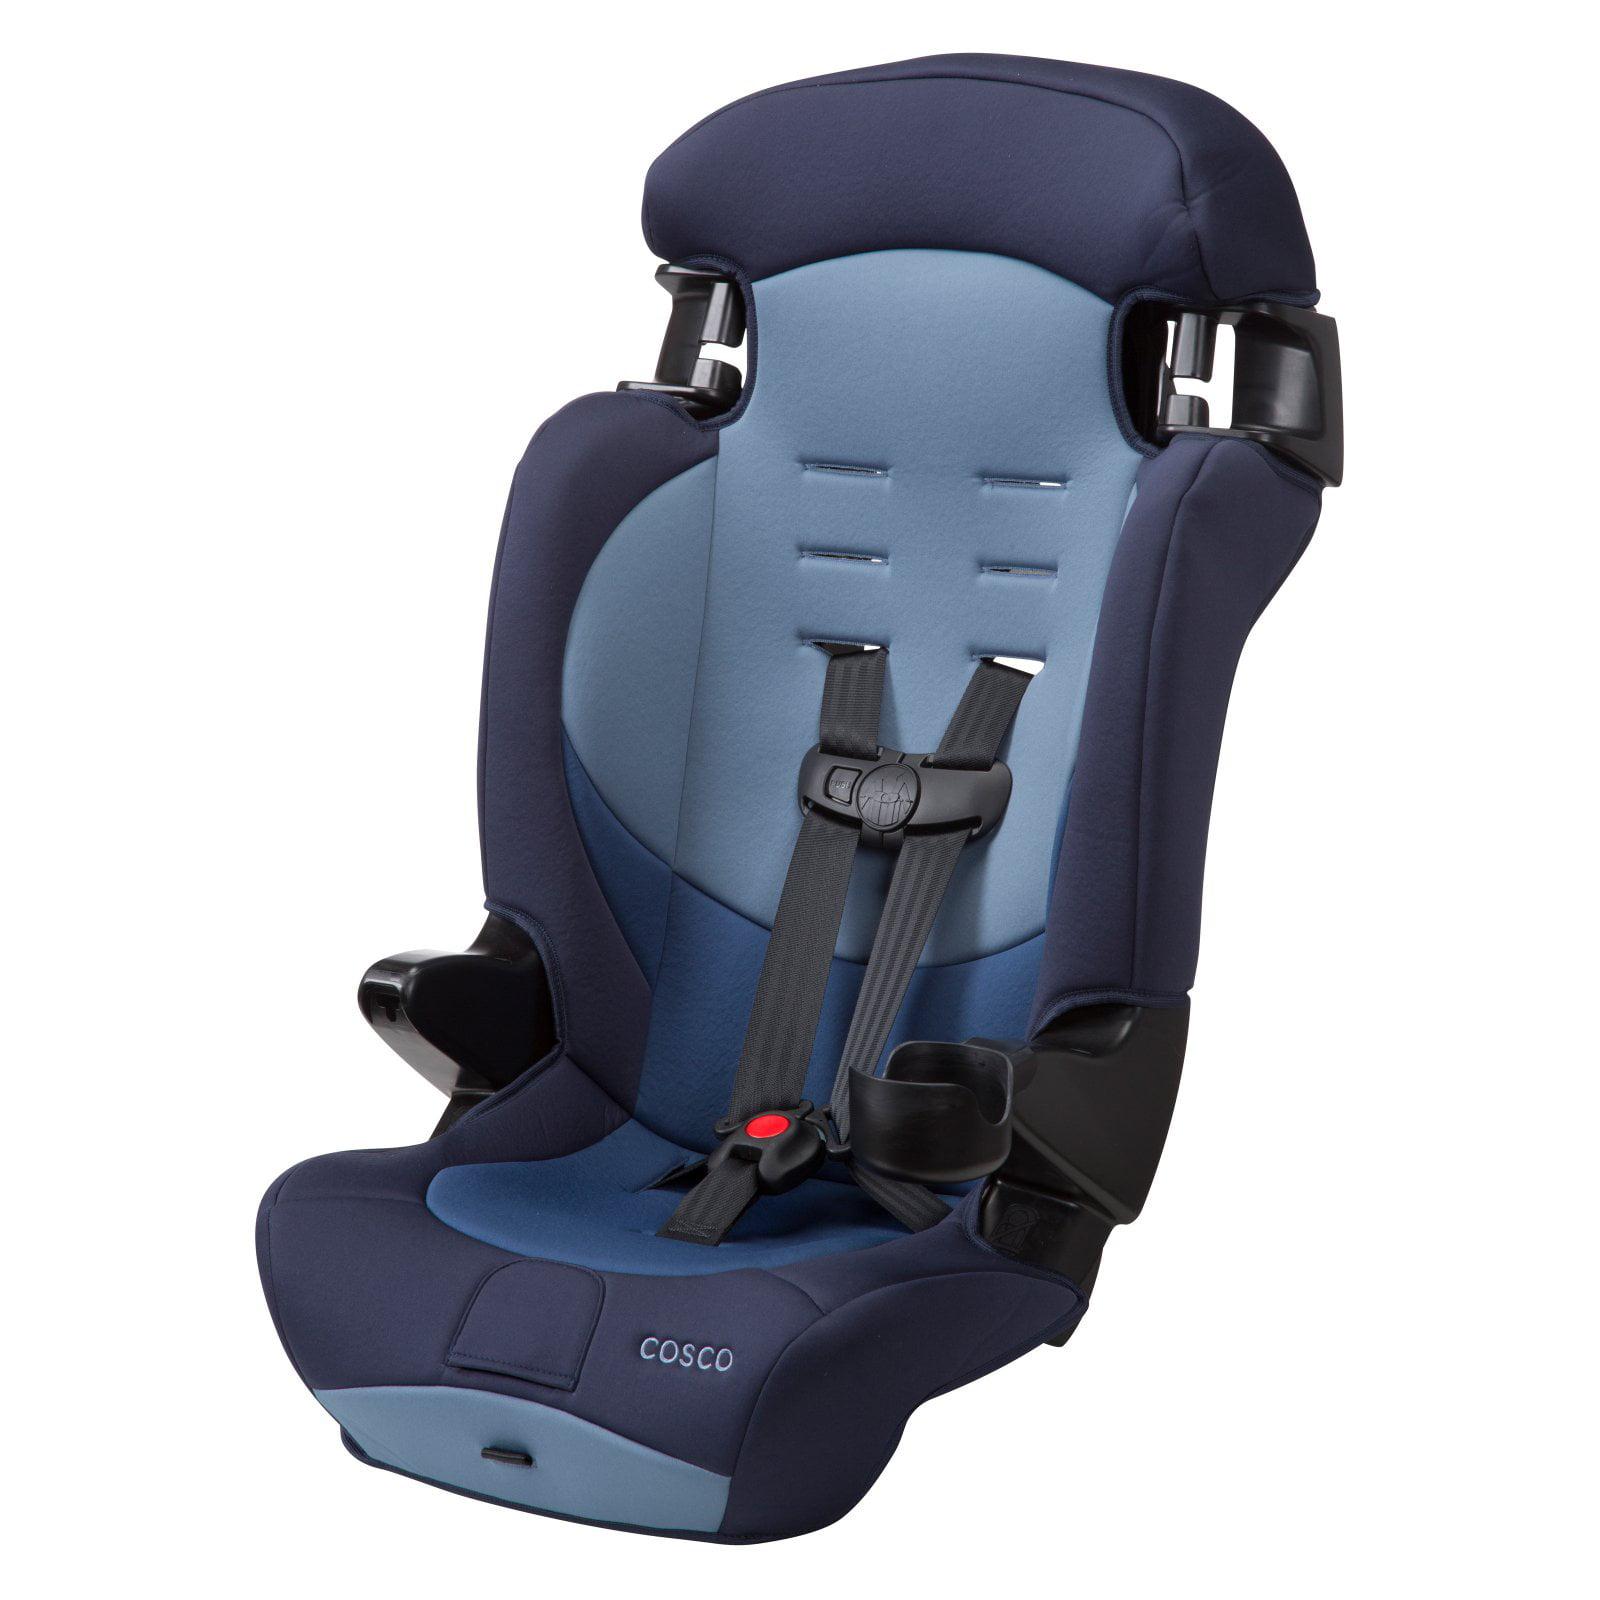 Cosco Finale DX 2-in-1 Booster Car Seat - Sport Blue